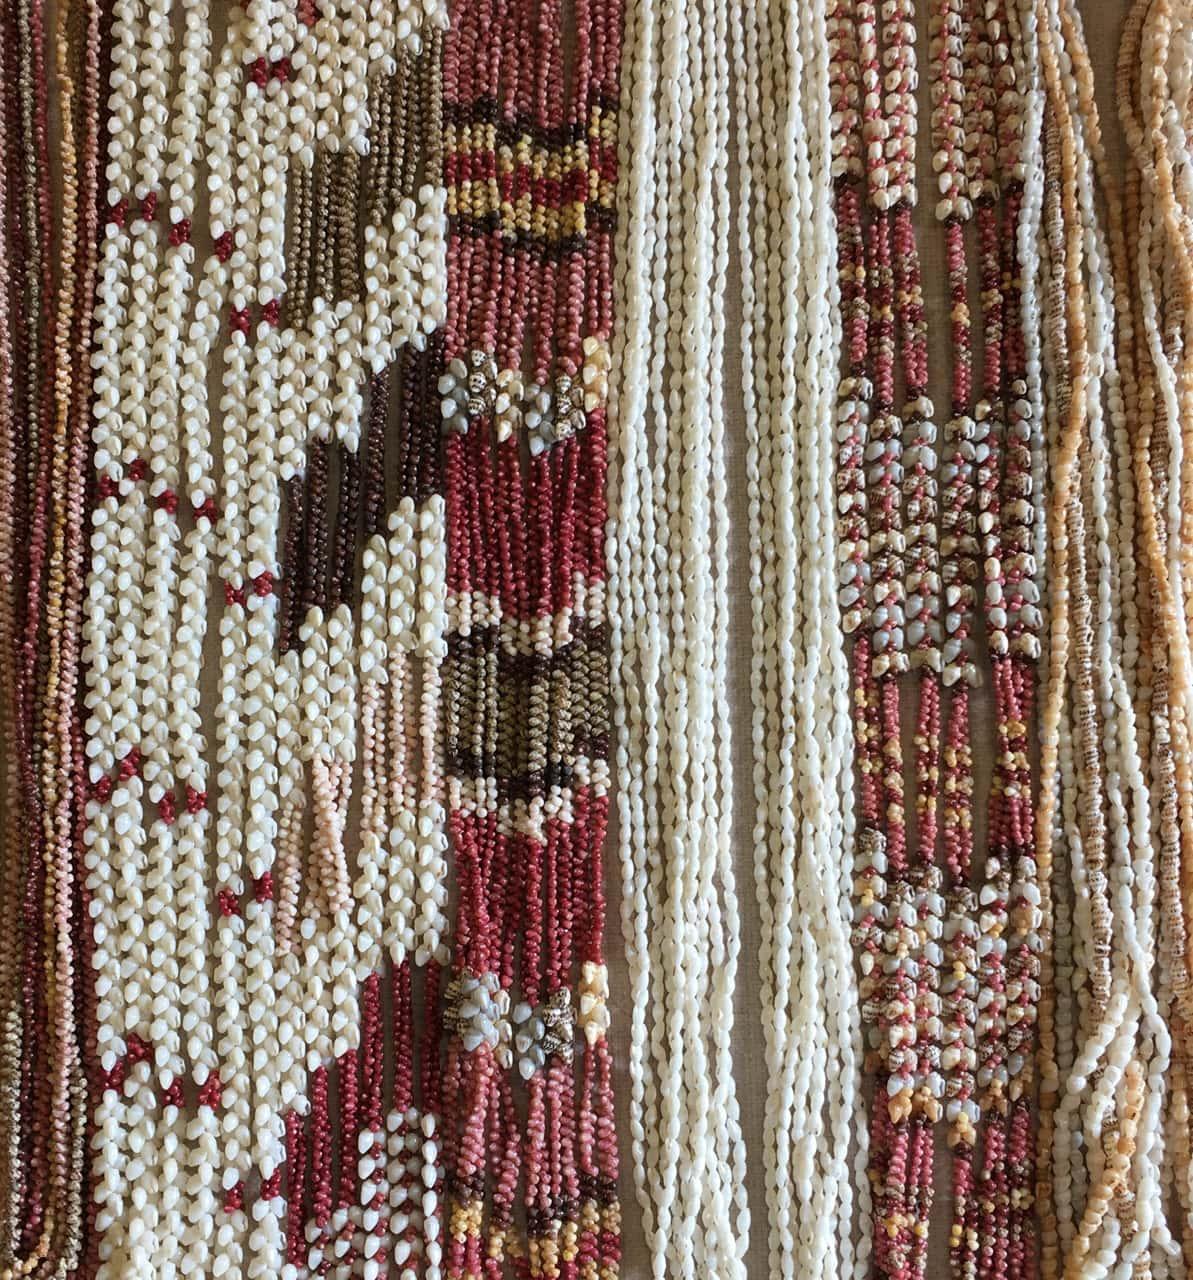 Niihau Niʻihau Collectorʻs Leis museum quality